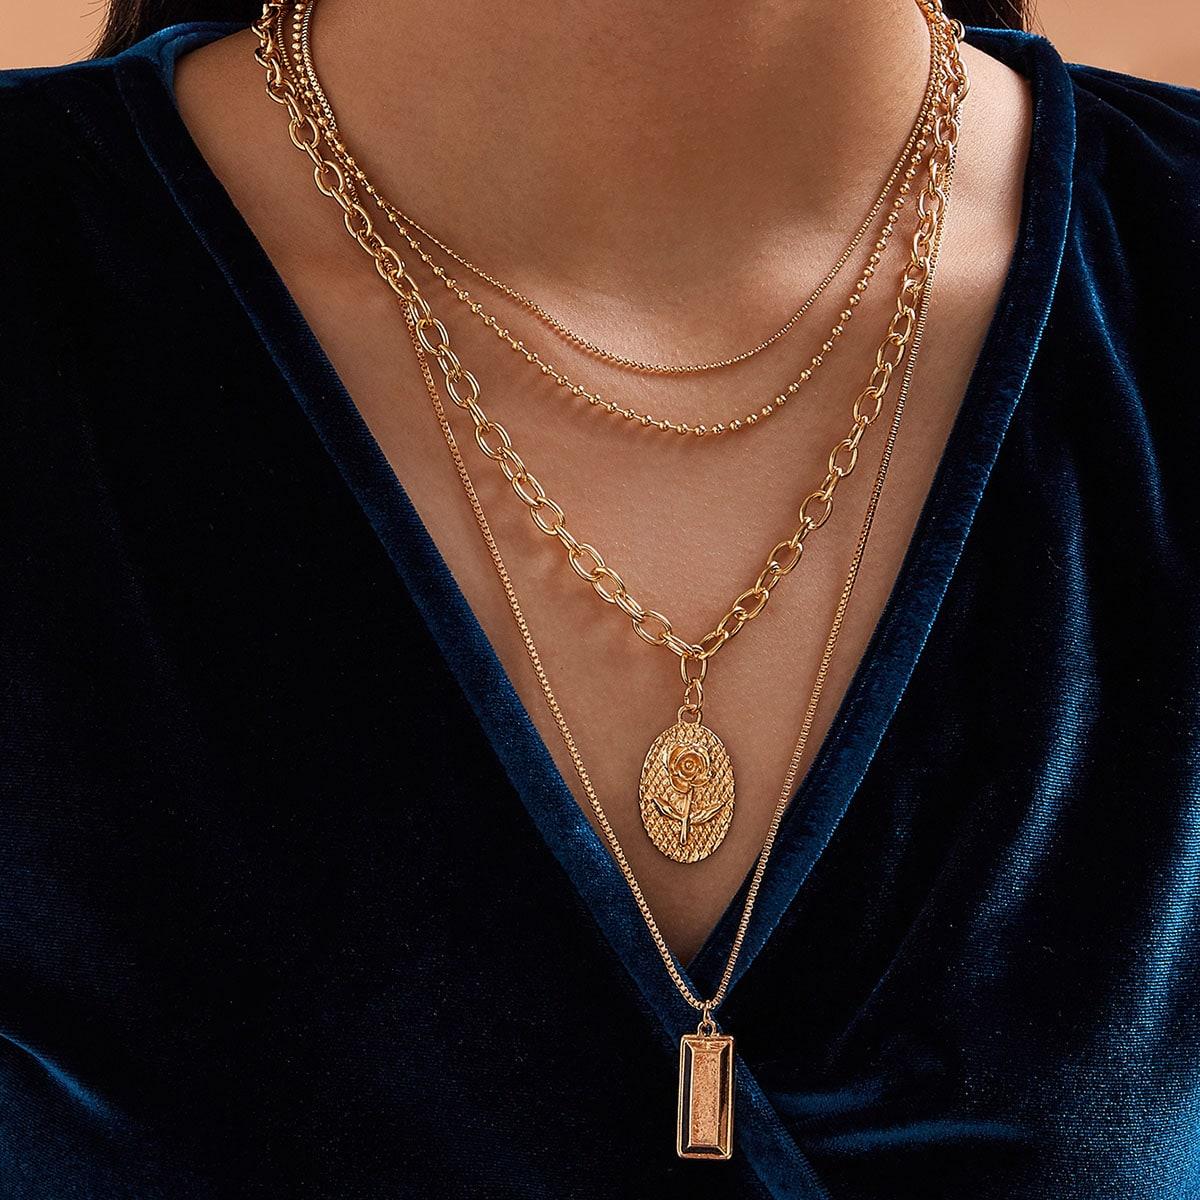 4pcs Rose & Geometric Charm Necklace